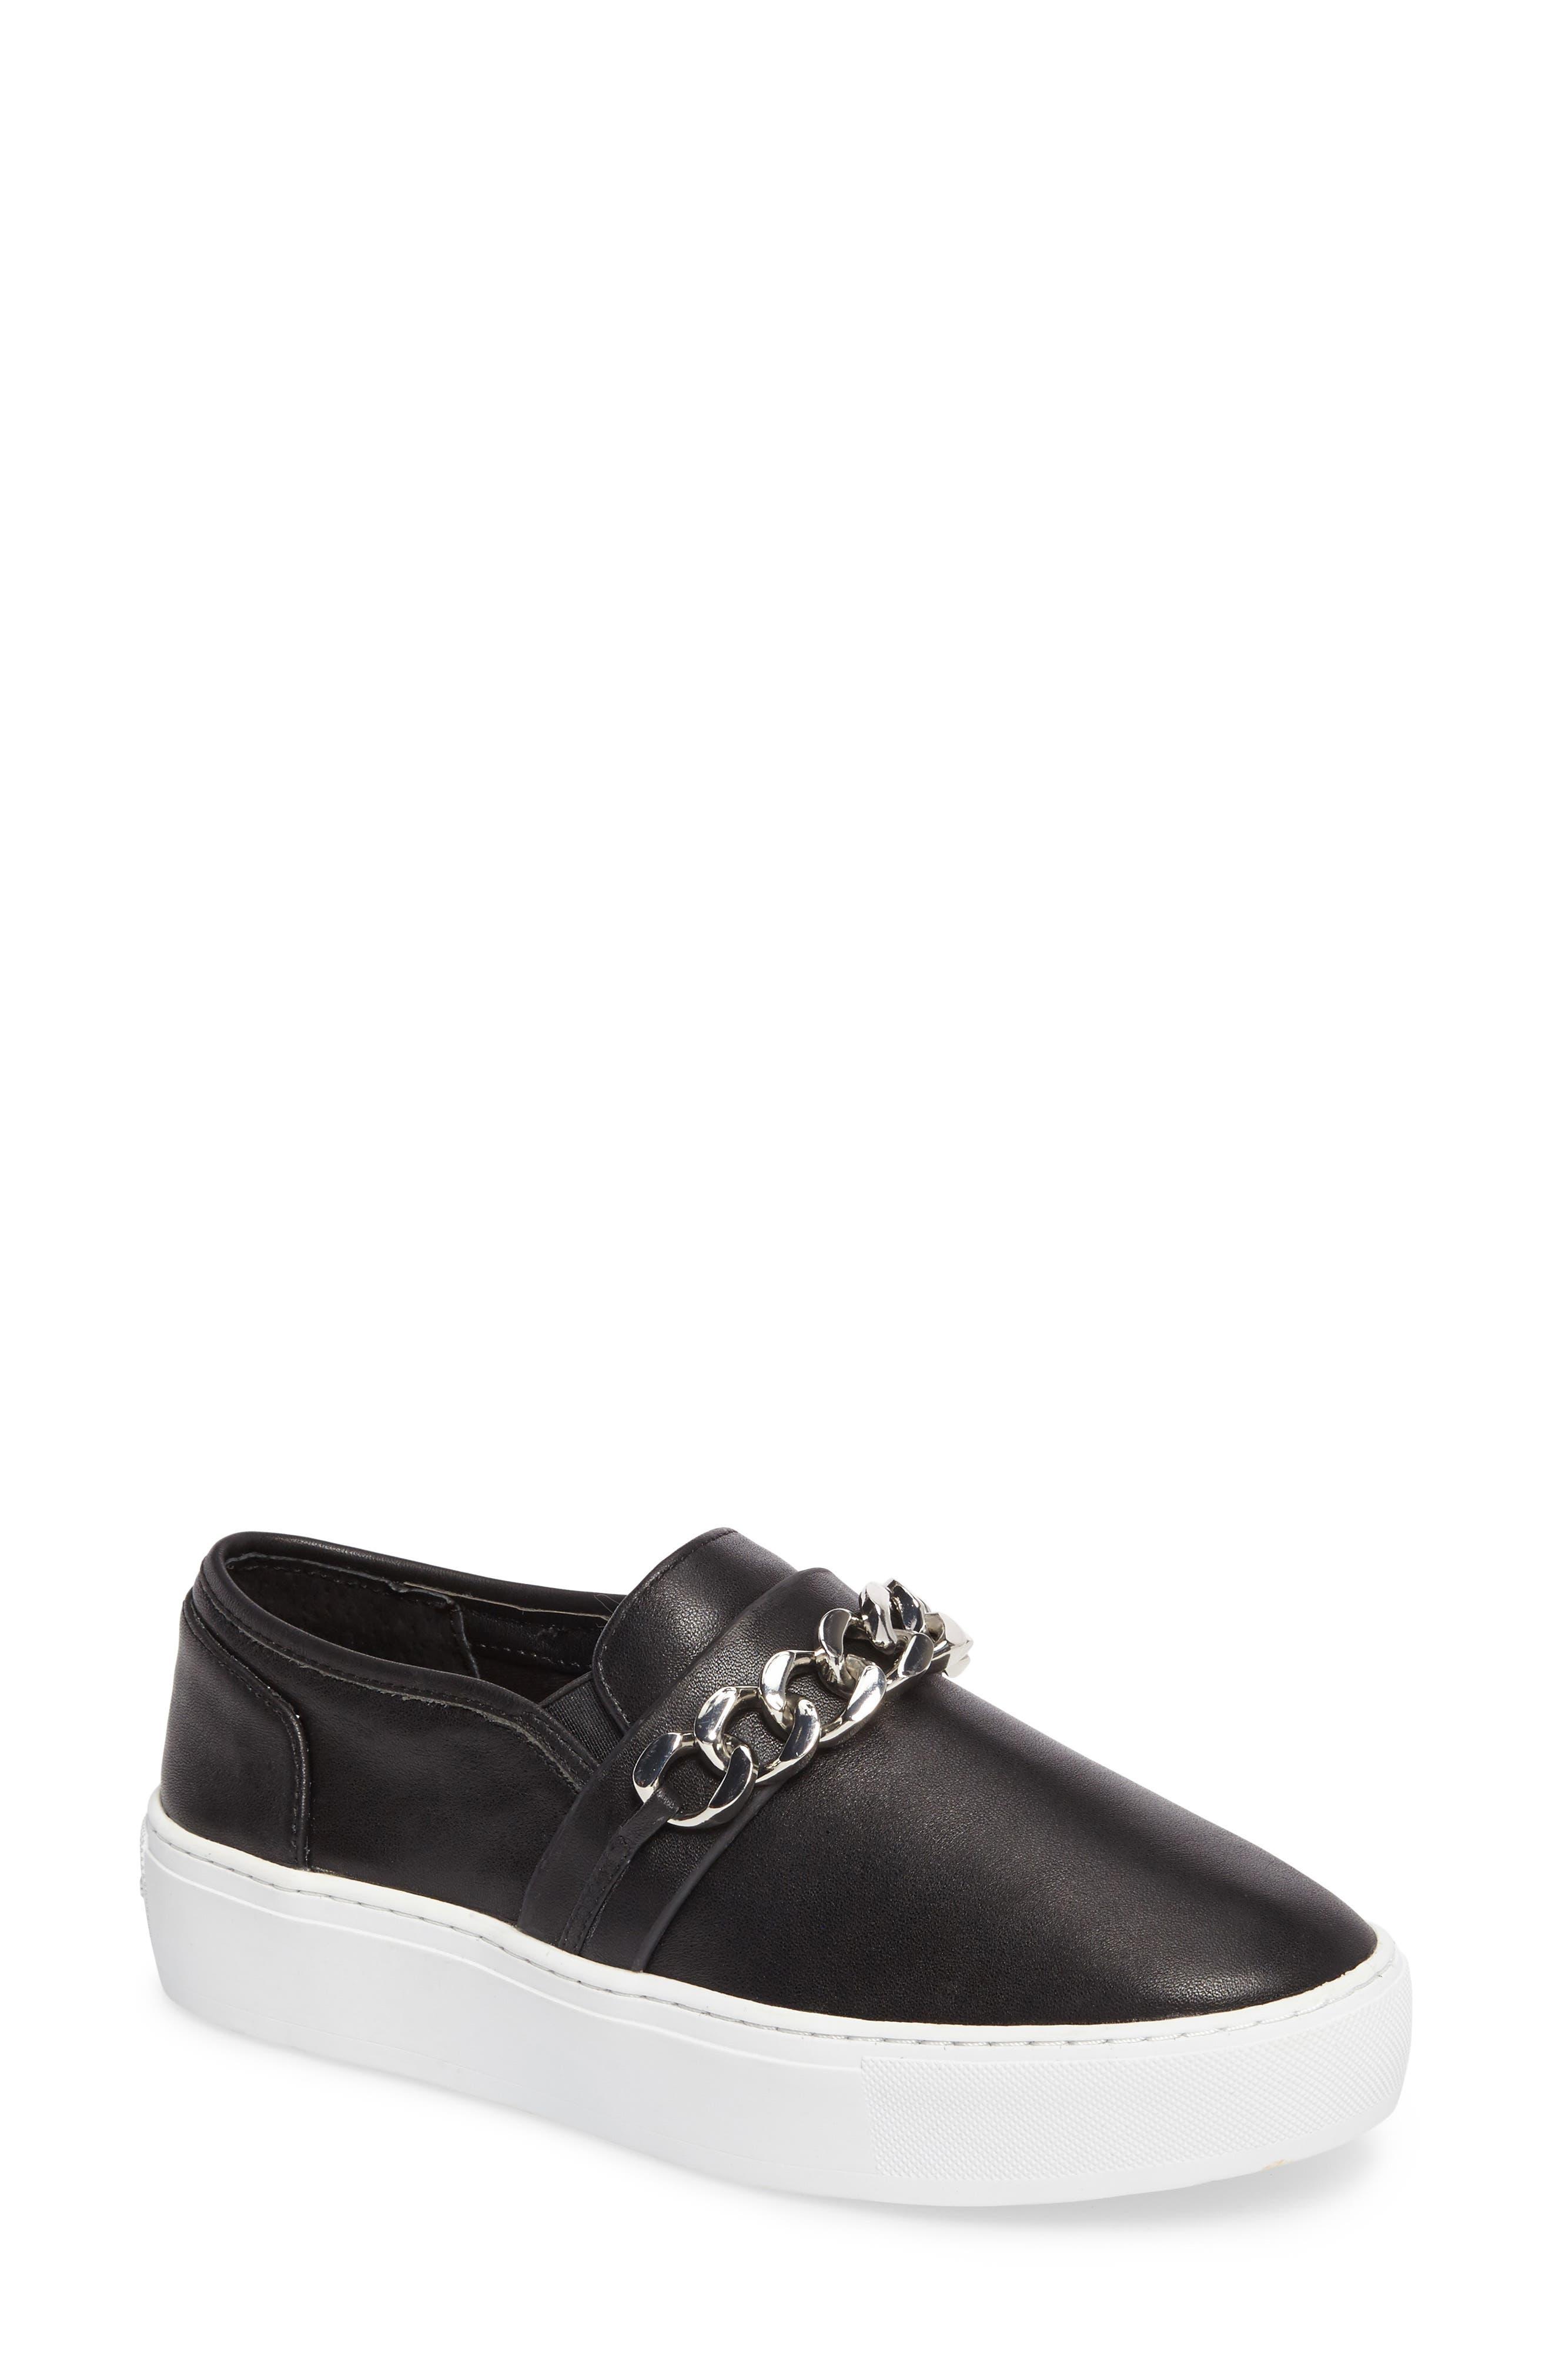 Nala Slip-On Sneaker,                             Main thumbnail 1, color,                             Black Leather